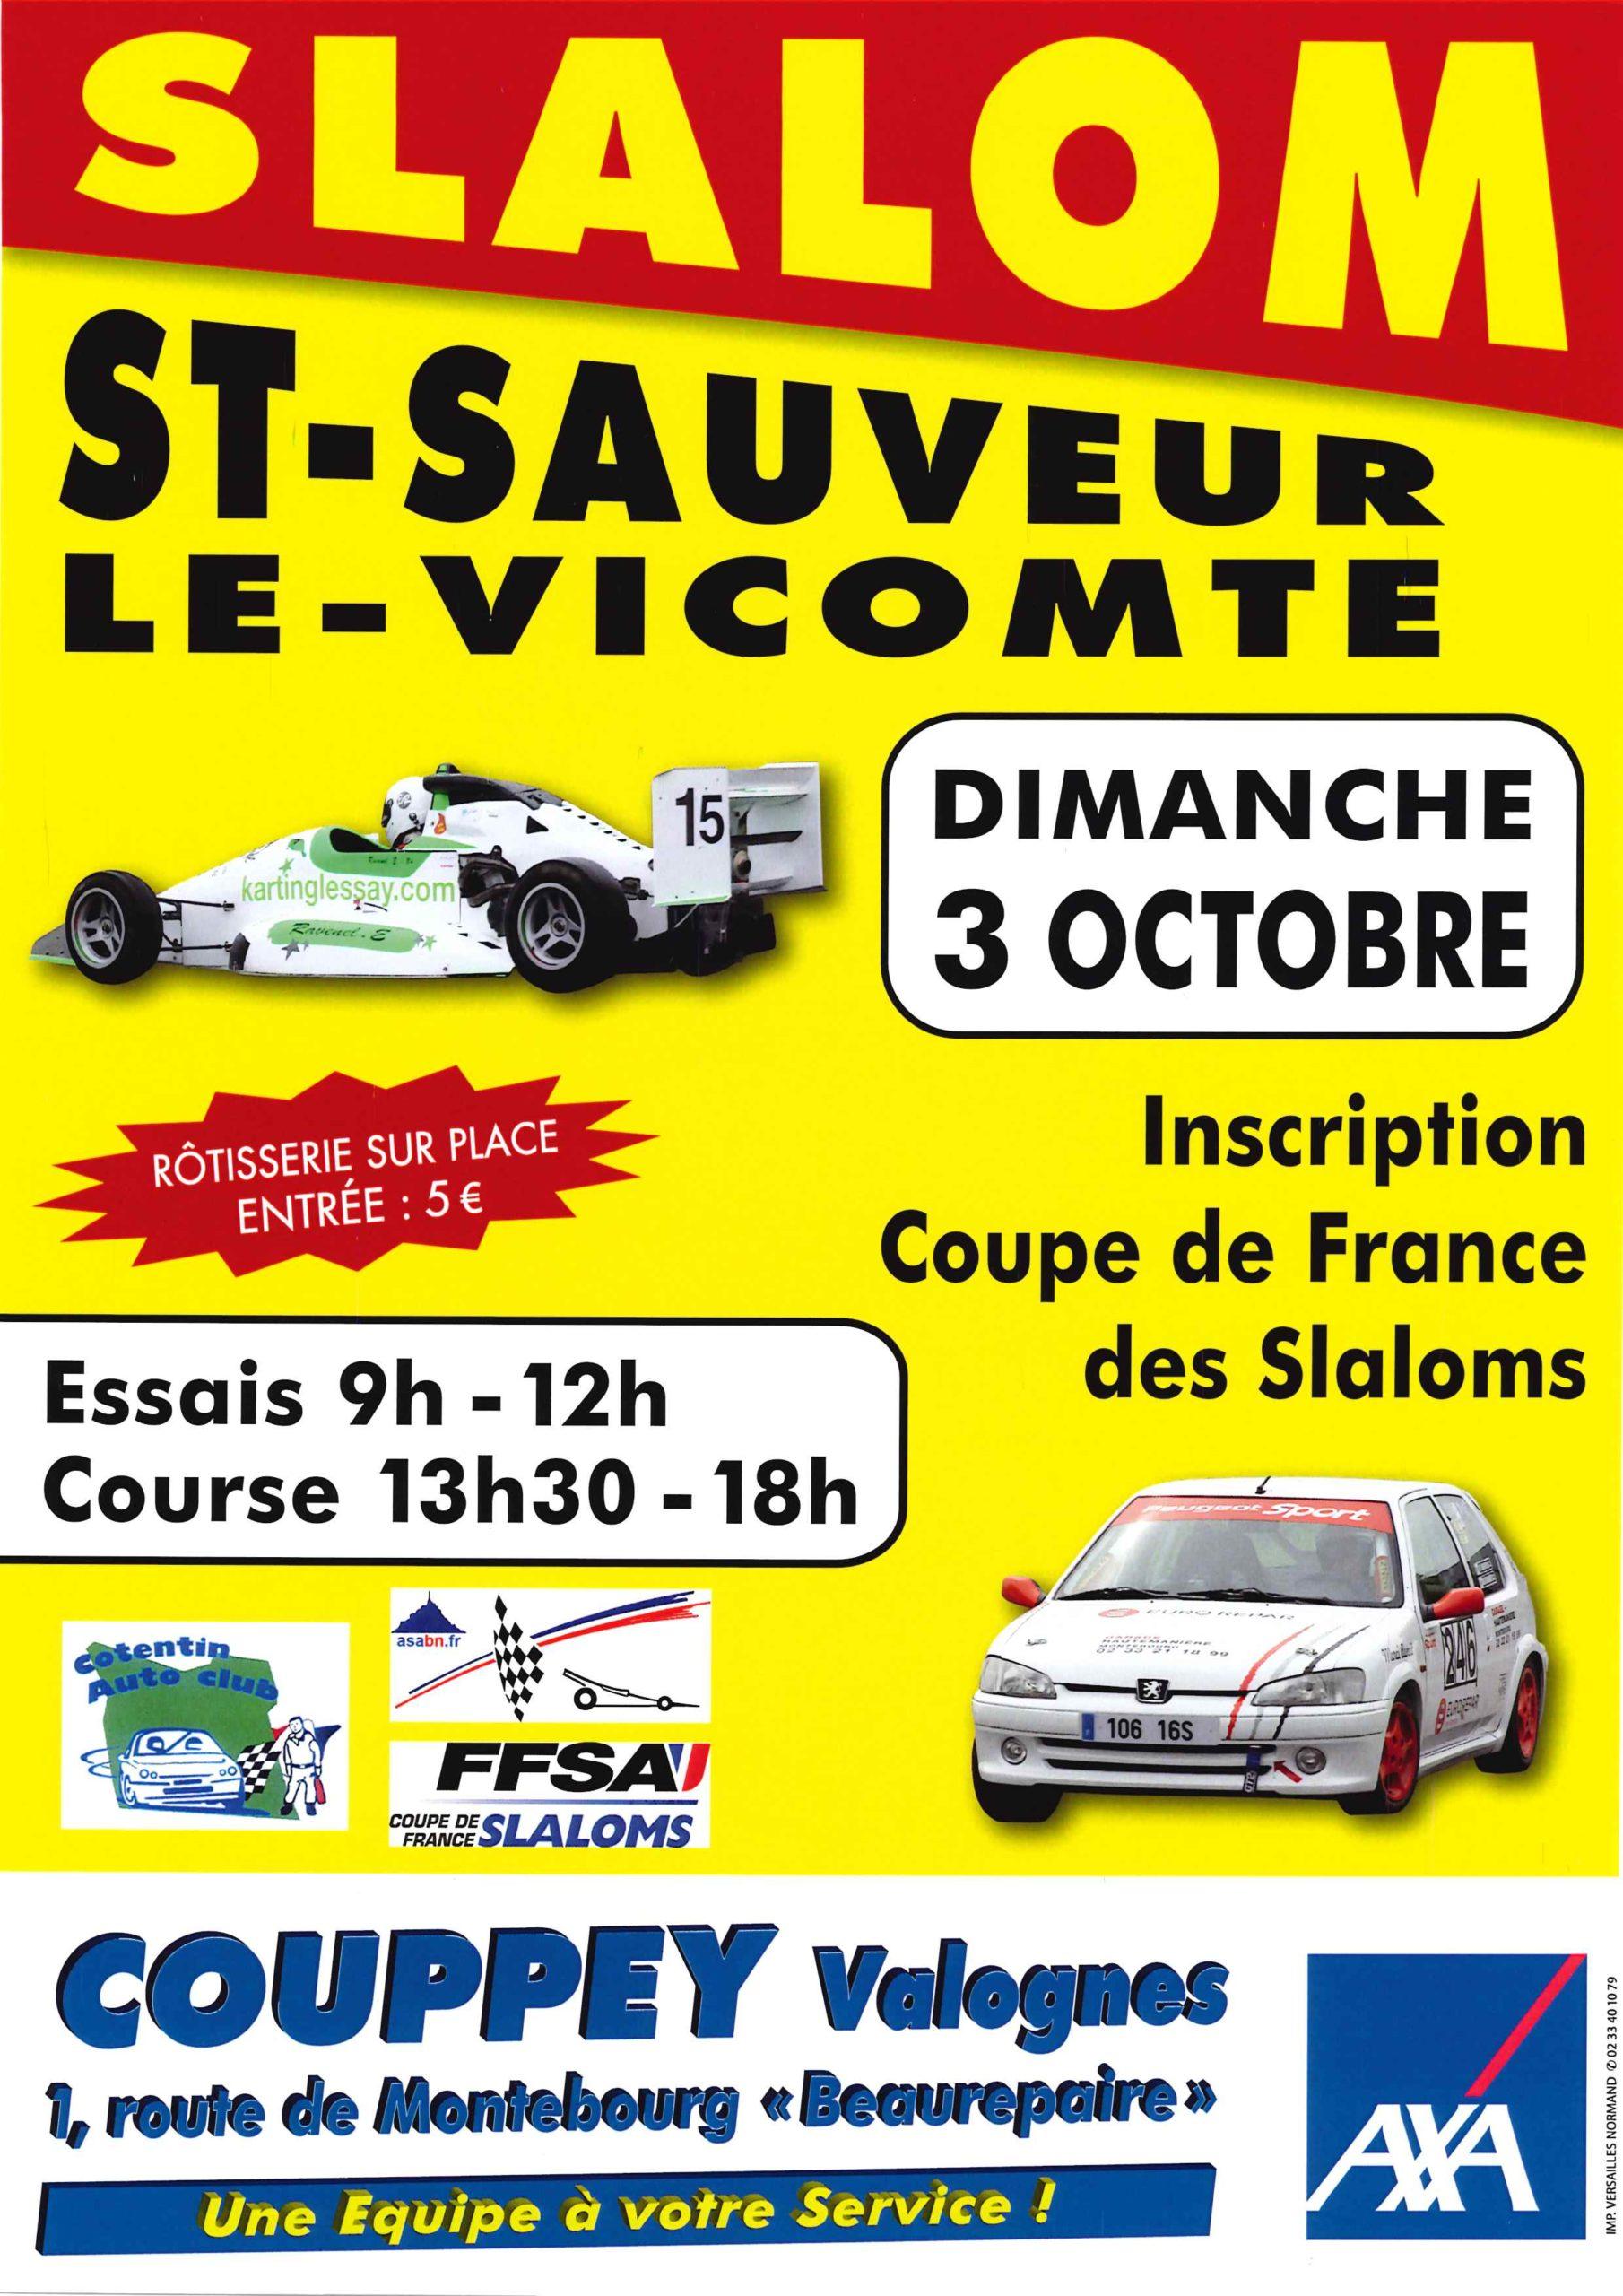 Slalom Automobile